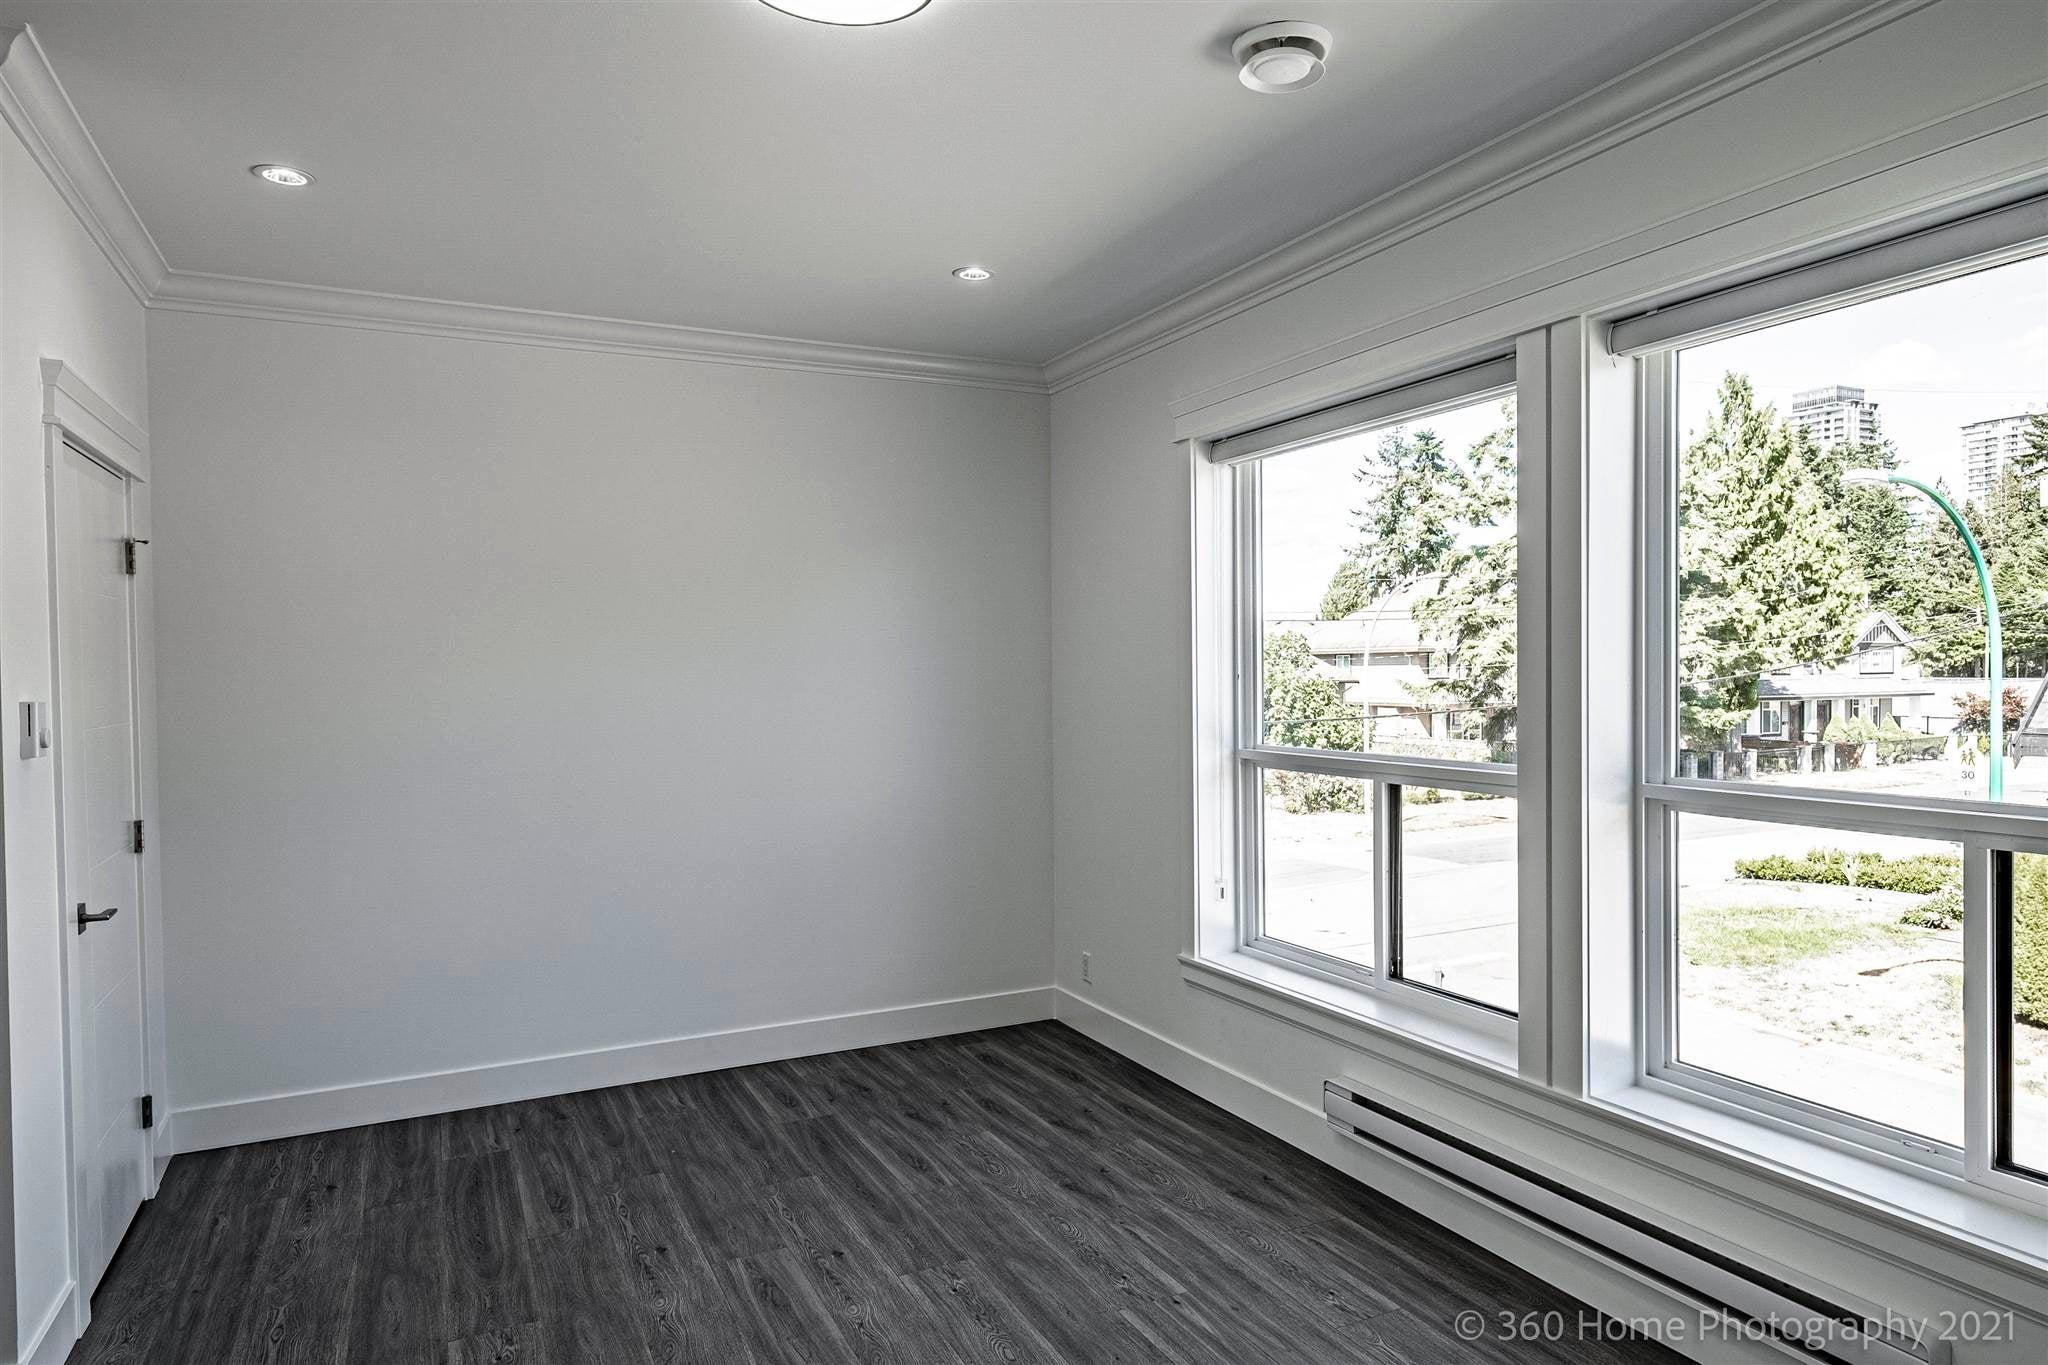 13050 101B AVENUE - Cedar Hills House/Single Family for sale, 5 Bedrooms (R2602208) - #14